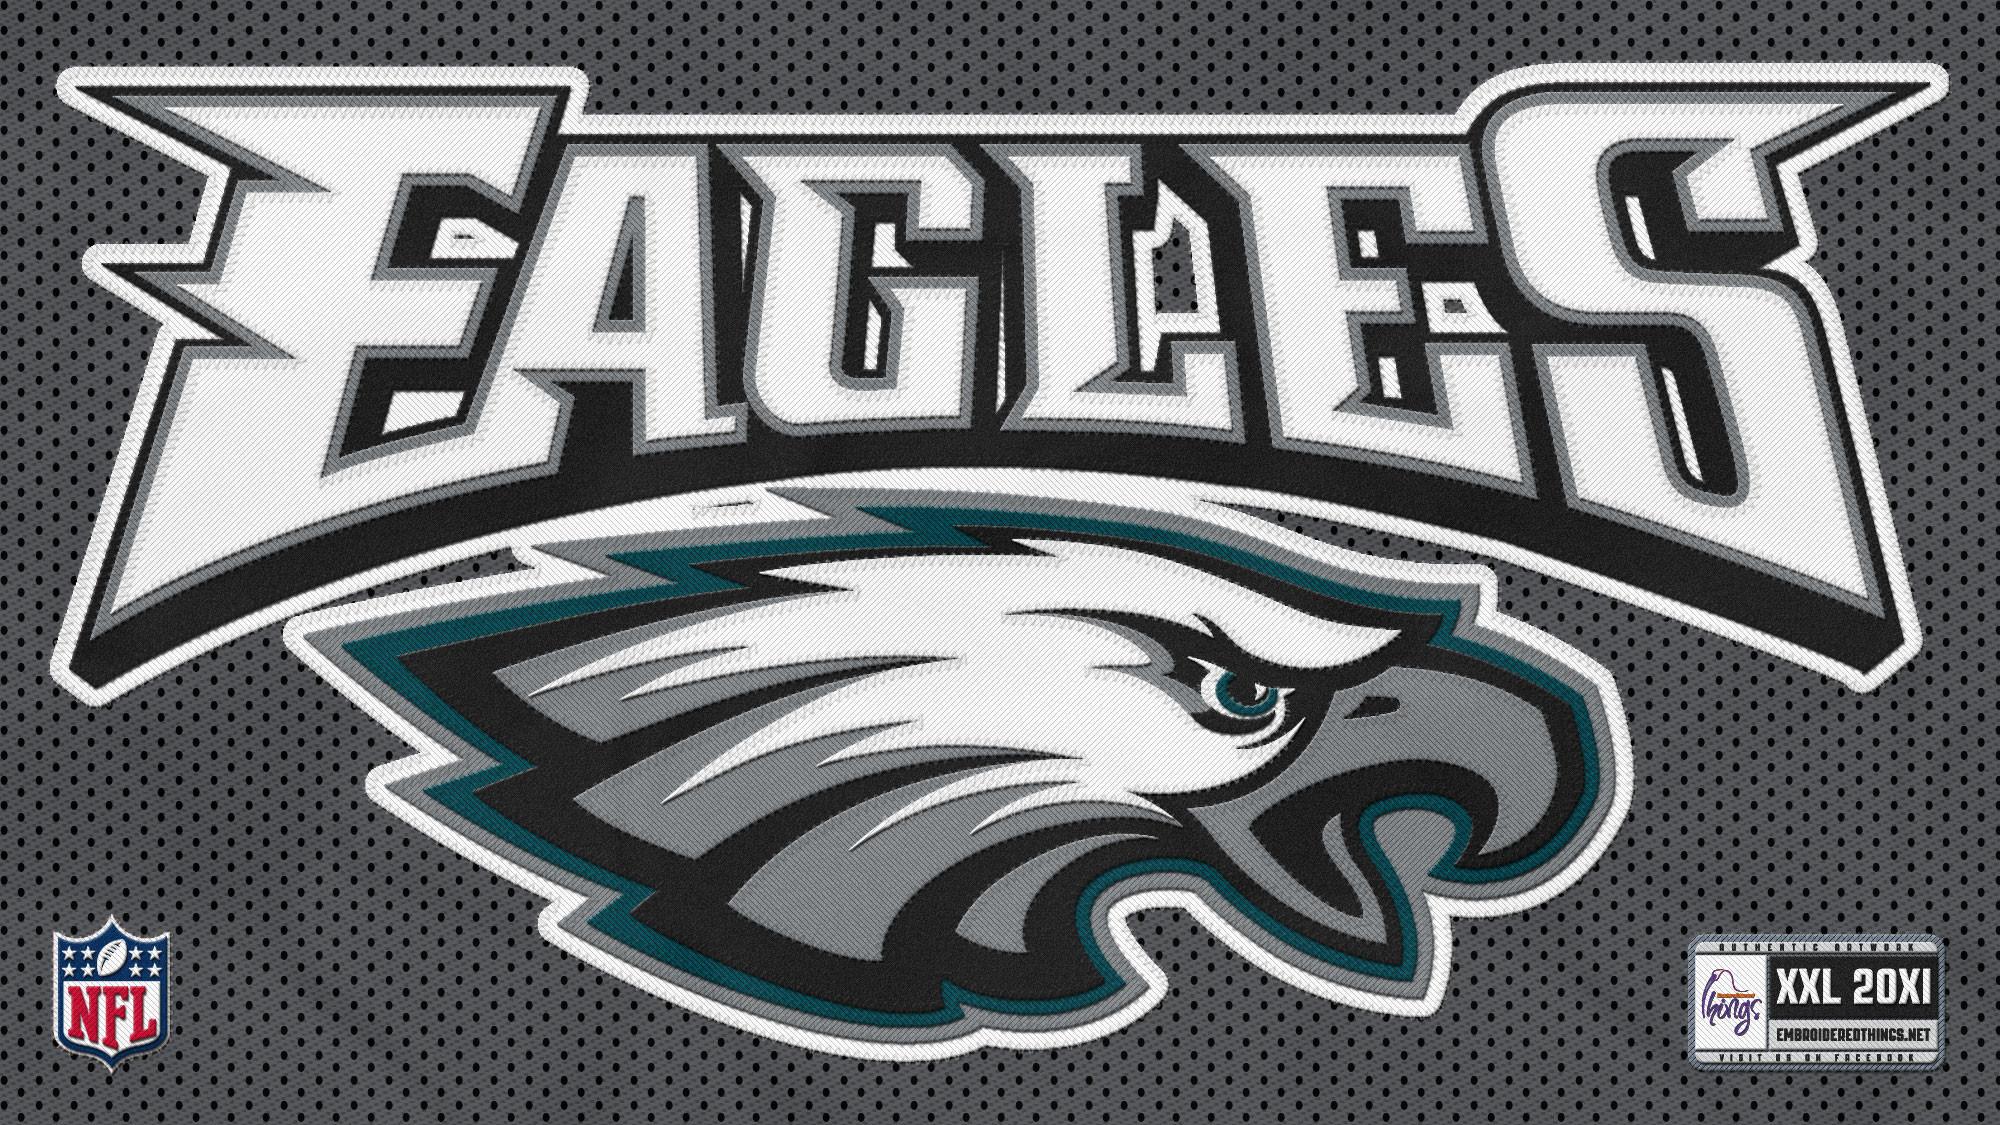 Philadelphia Eagles Logo HD Desktop Wallpaper   HD Desktop Wallpaper